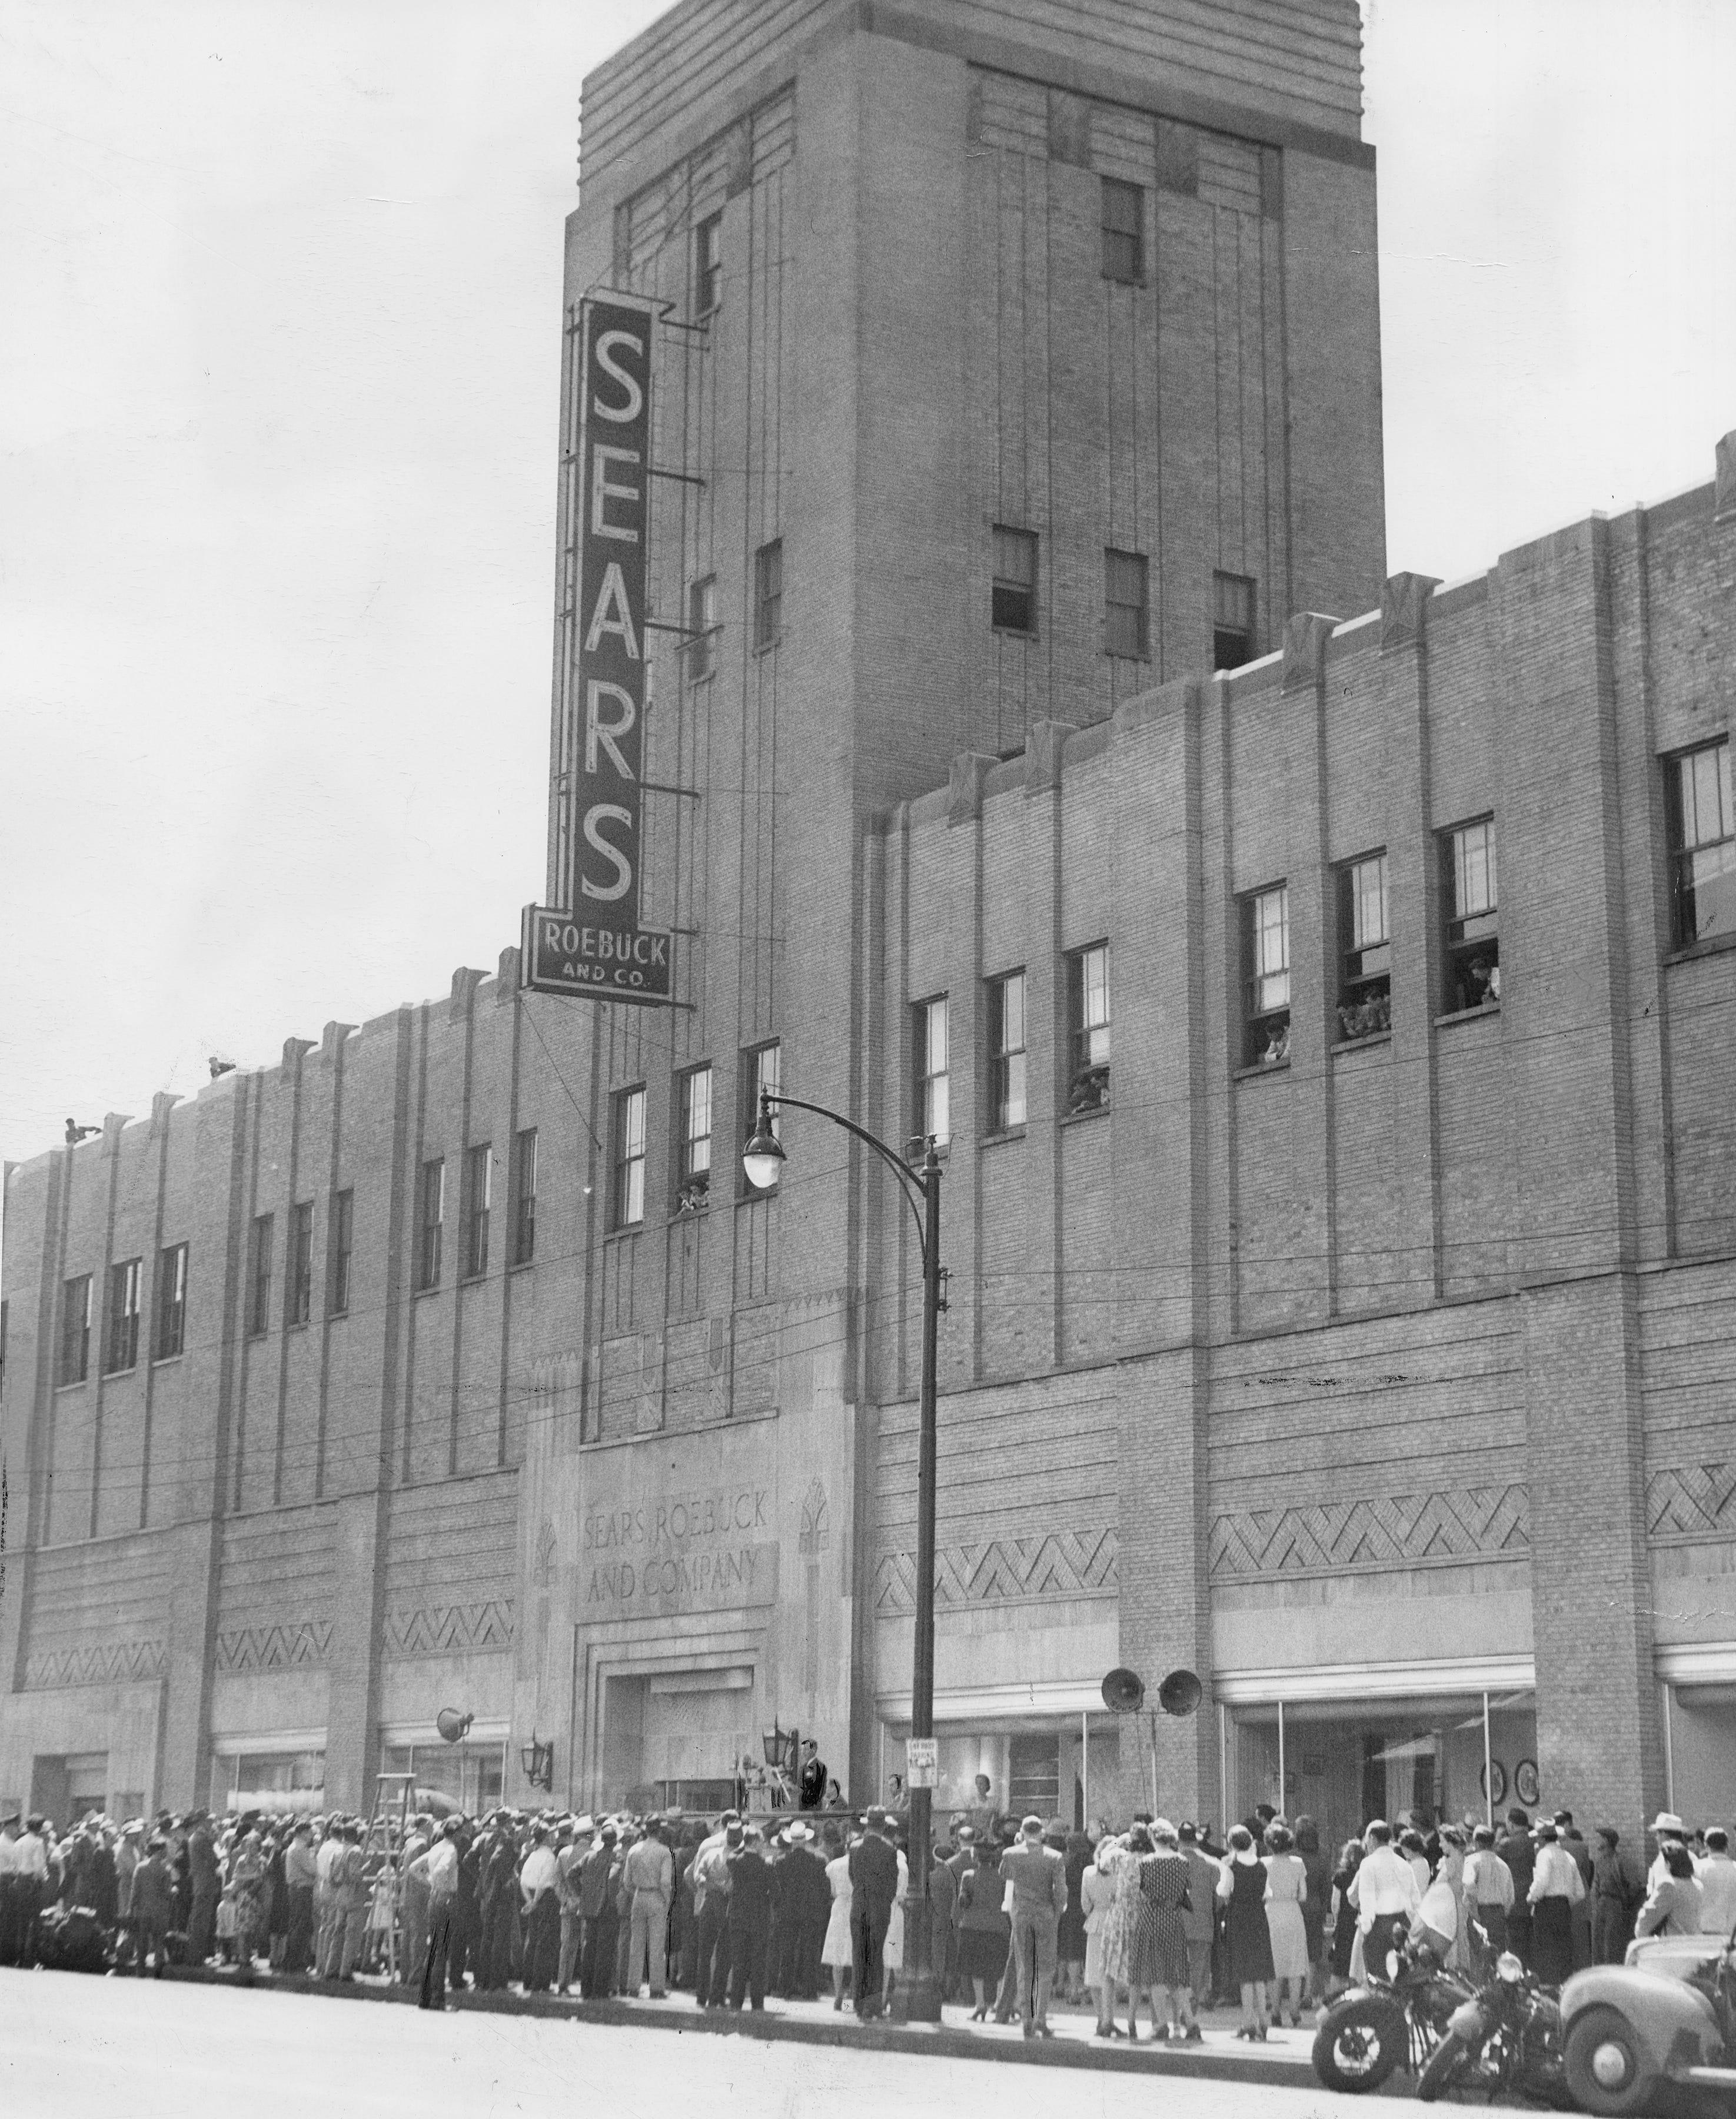 237de1a51b4 Sears roebuck retail stores – USPosts